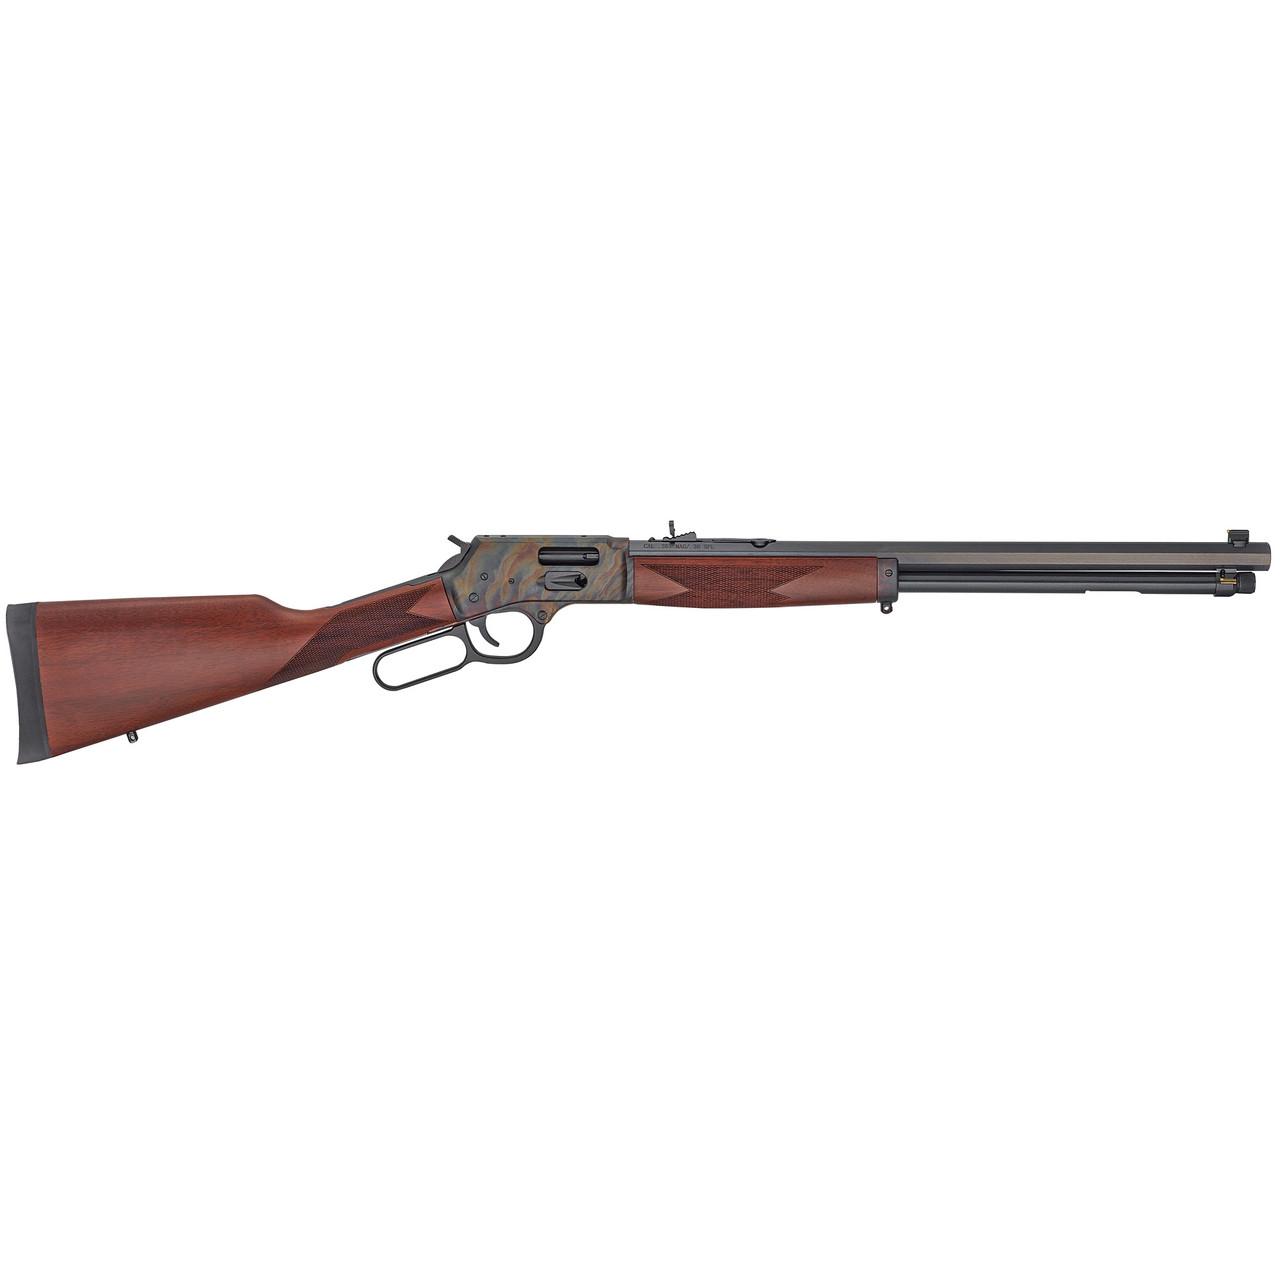 Henry Big Boy CALIFORNIA LEGAL - .45 Colt - Case Hardened